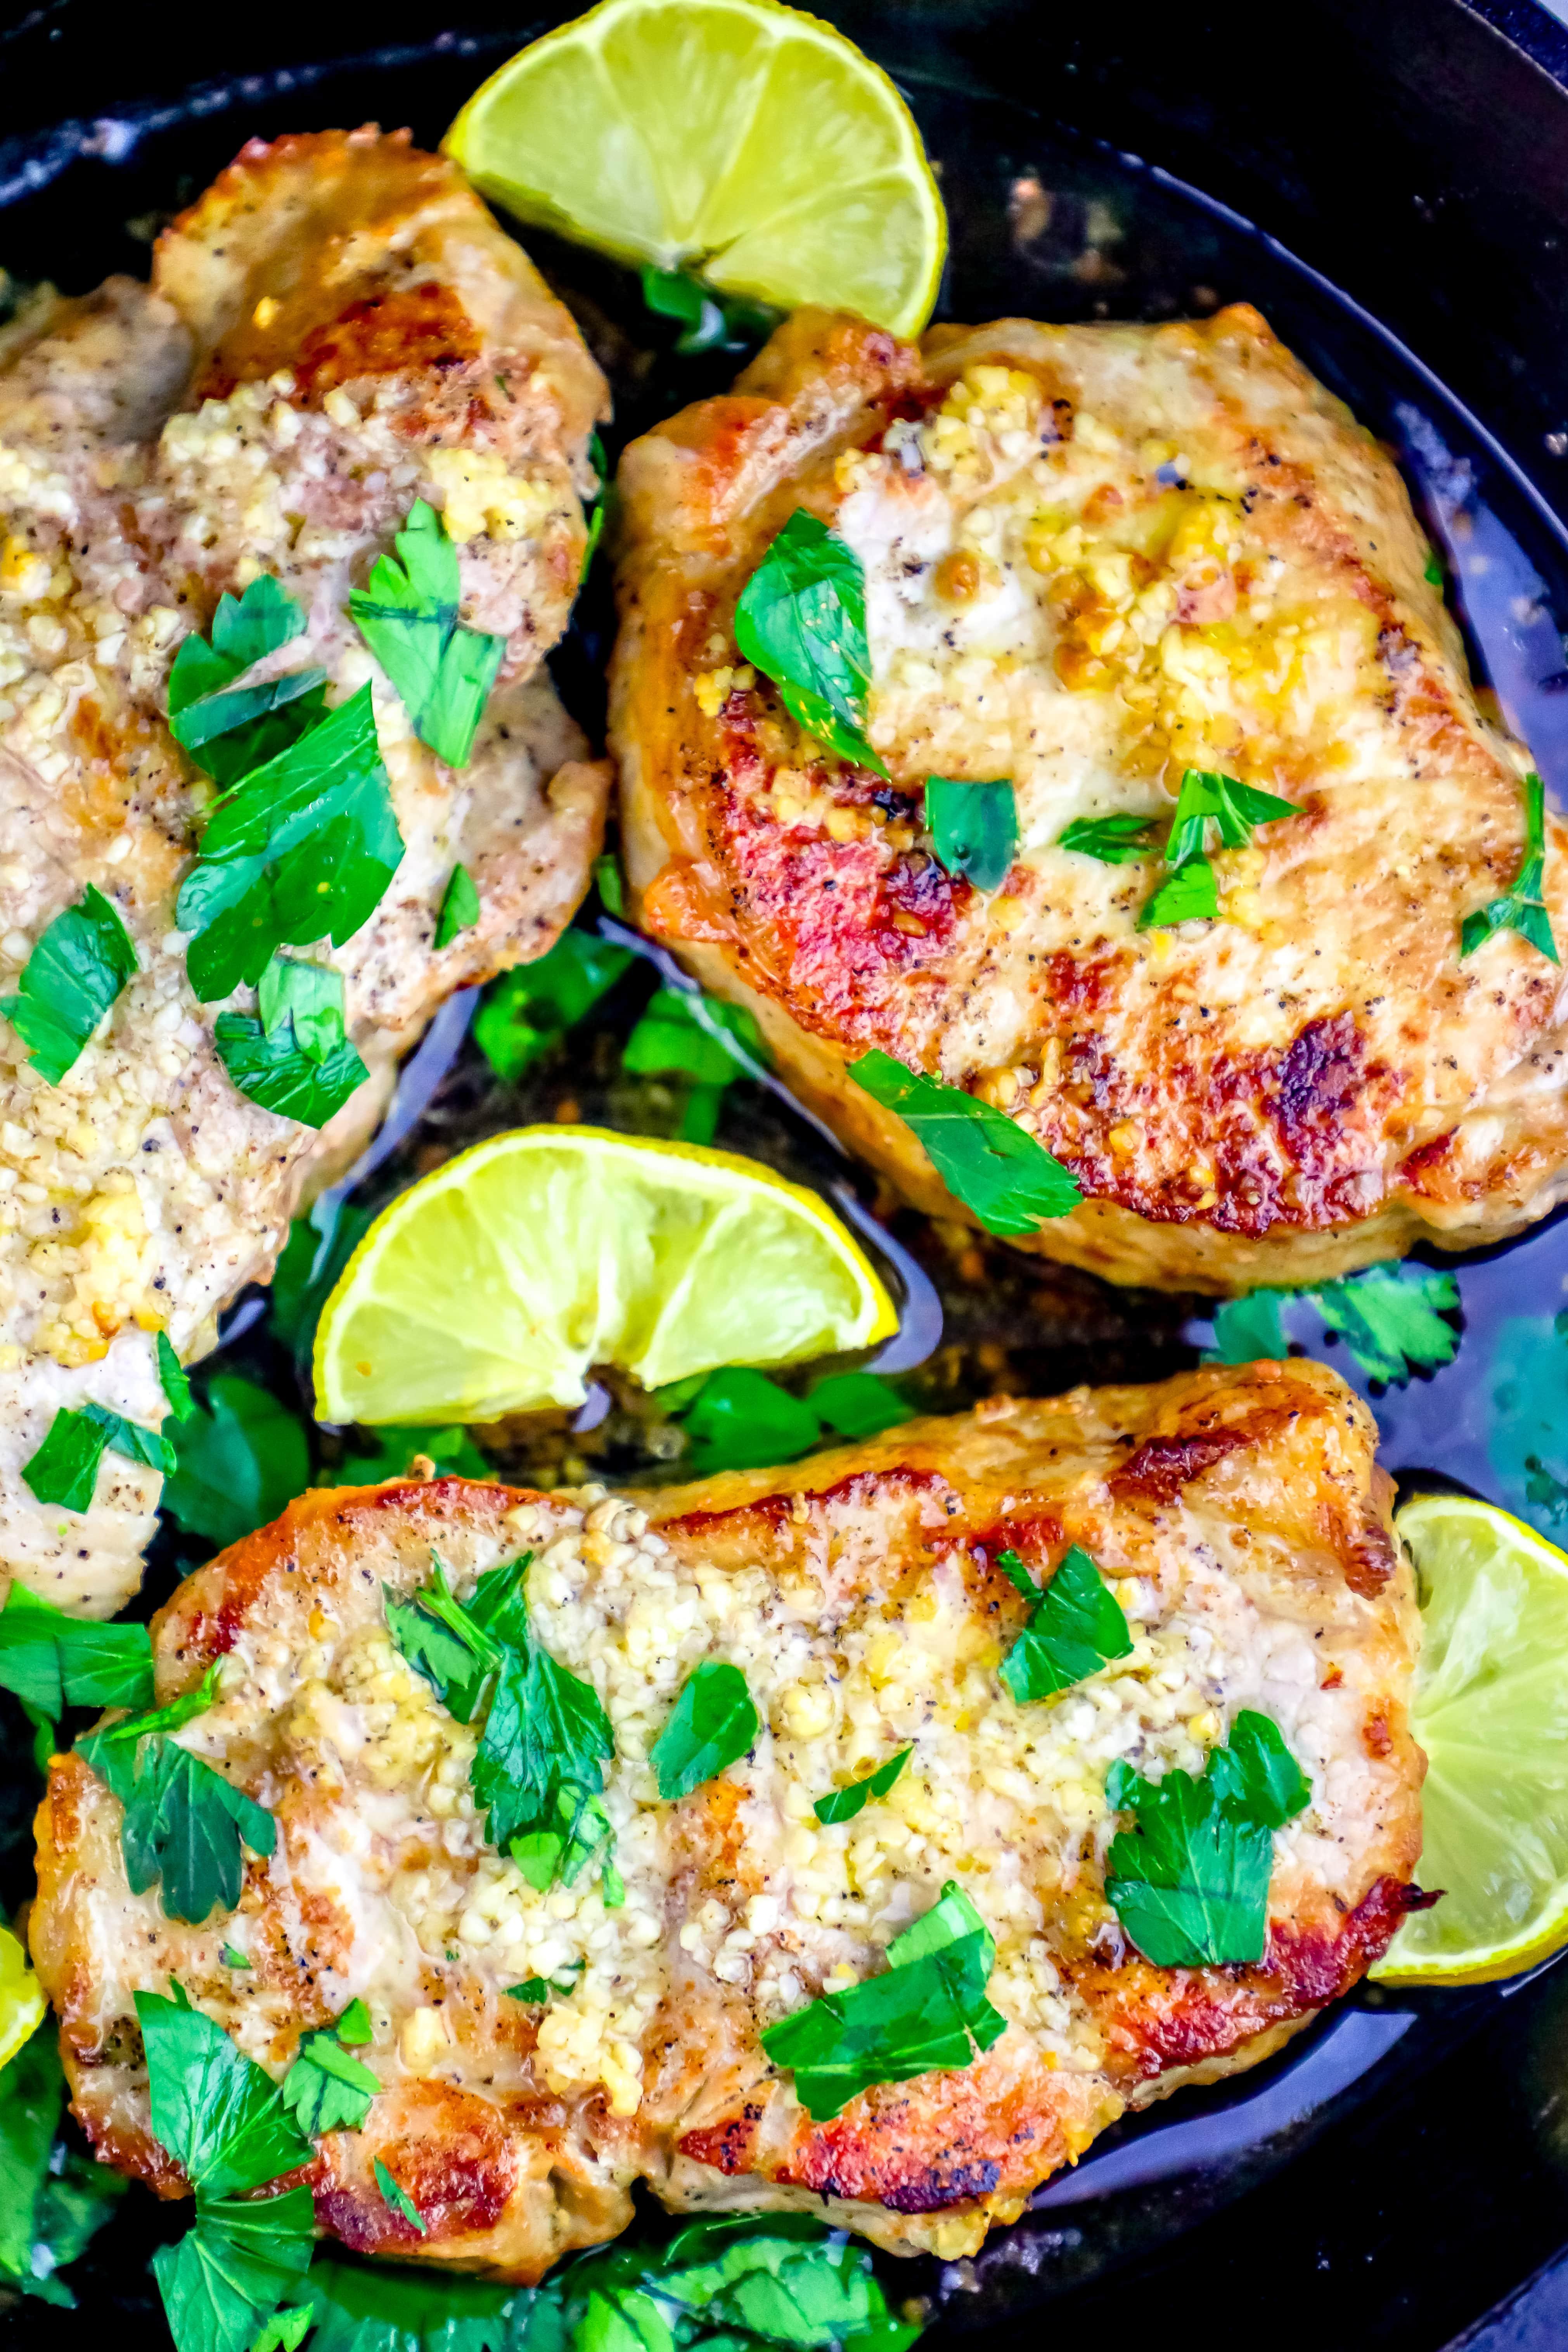 Best Baked Pork Chops  The Best Baked Garlic Pork Chops Recipe Oven Baked Pork